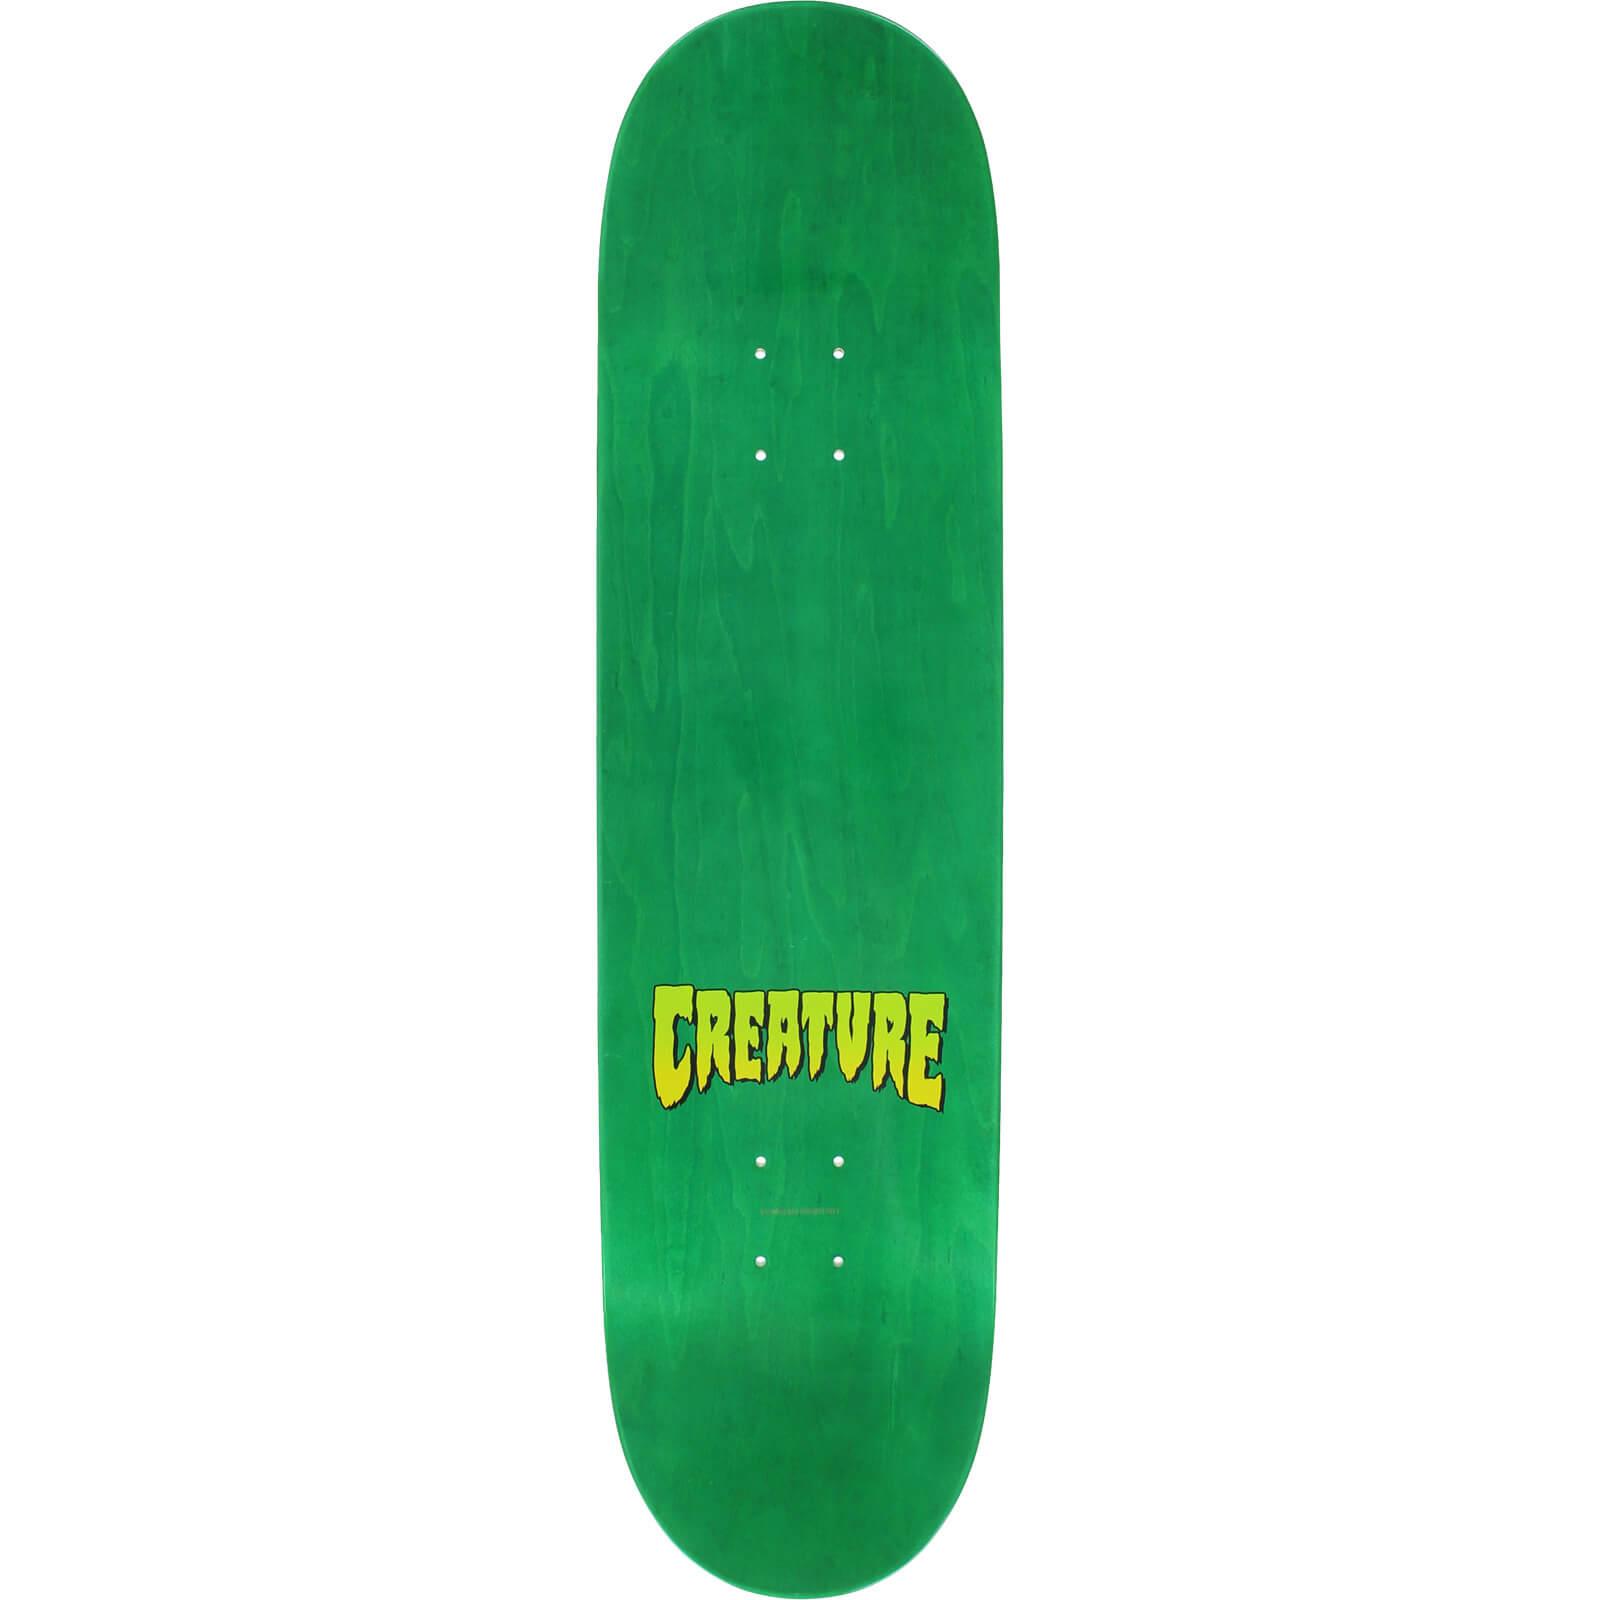 Creature Skateboards Sam Hitz Pro Logo Skateboard Deck 8